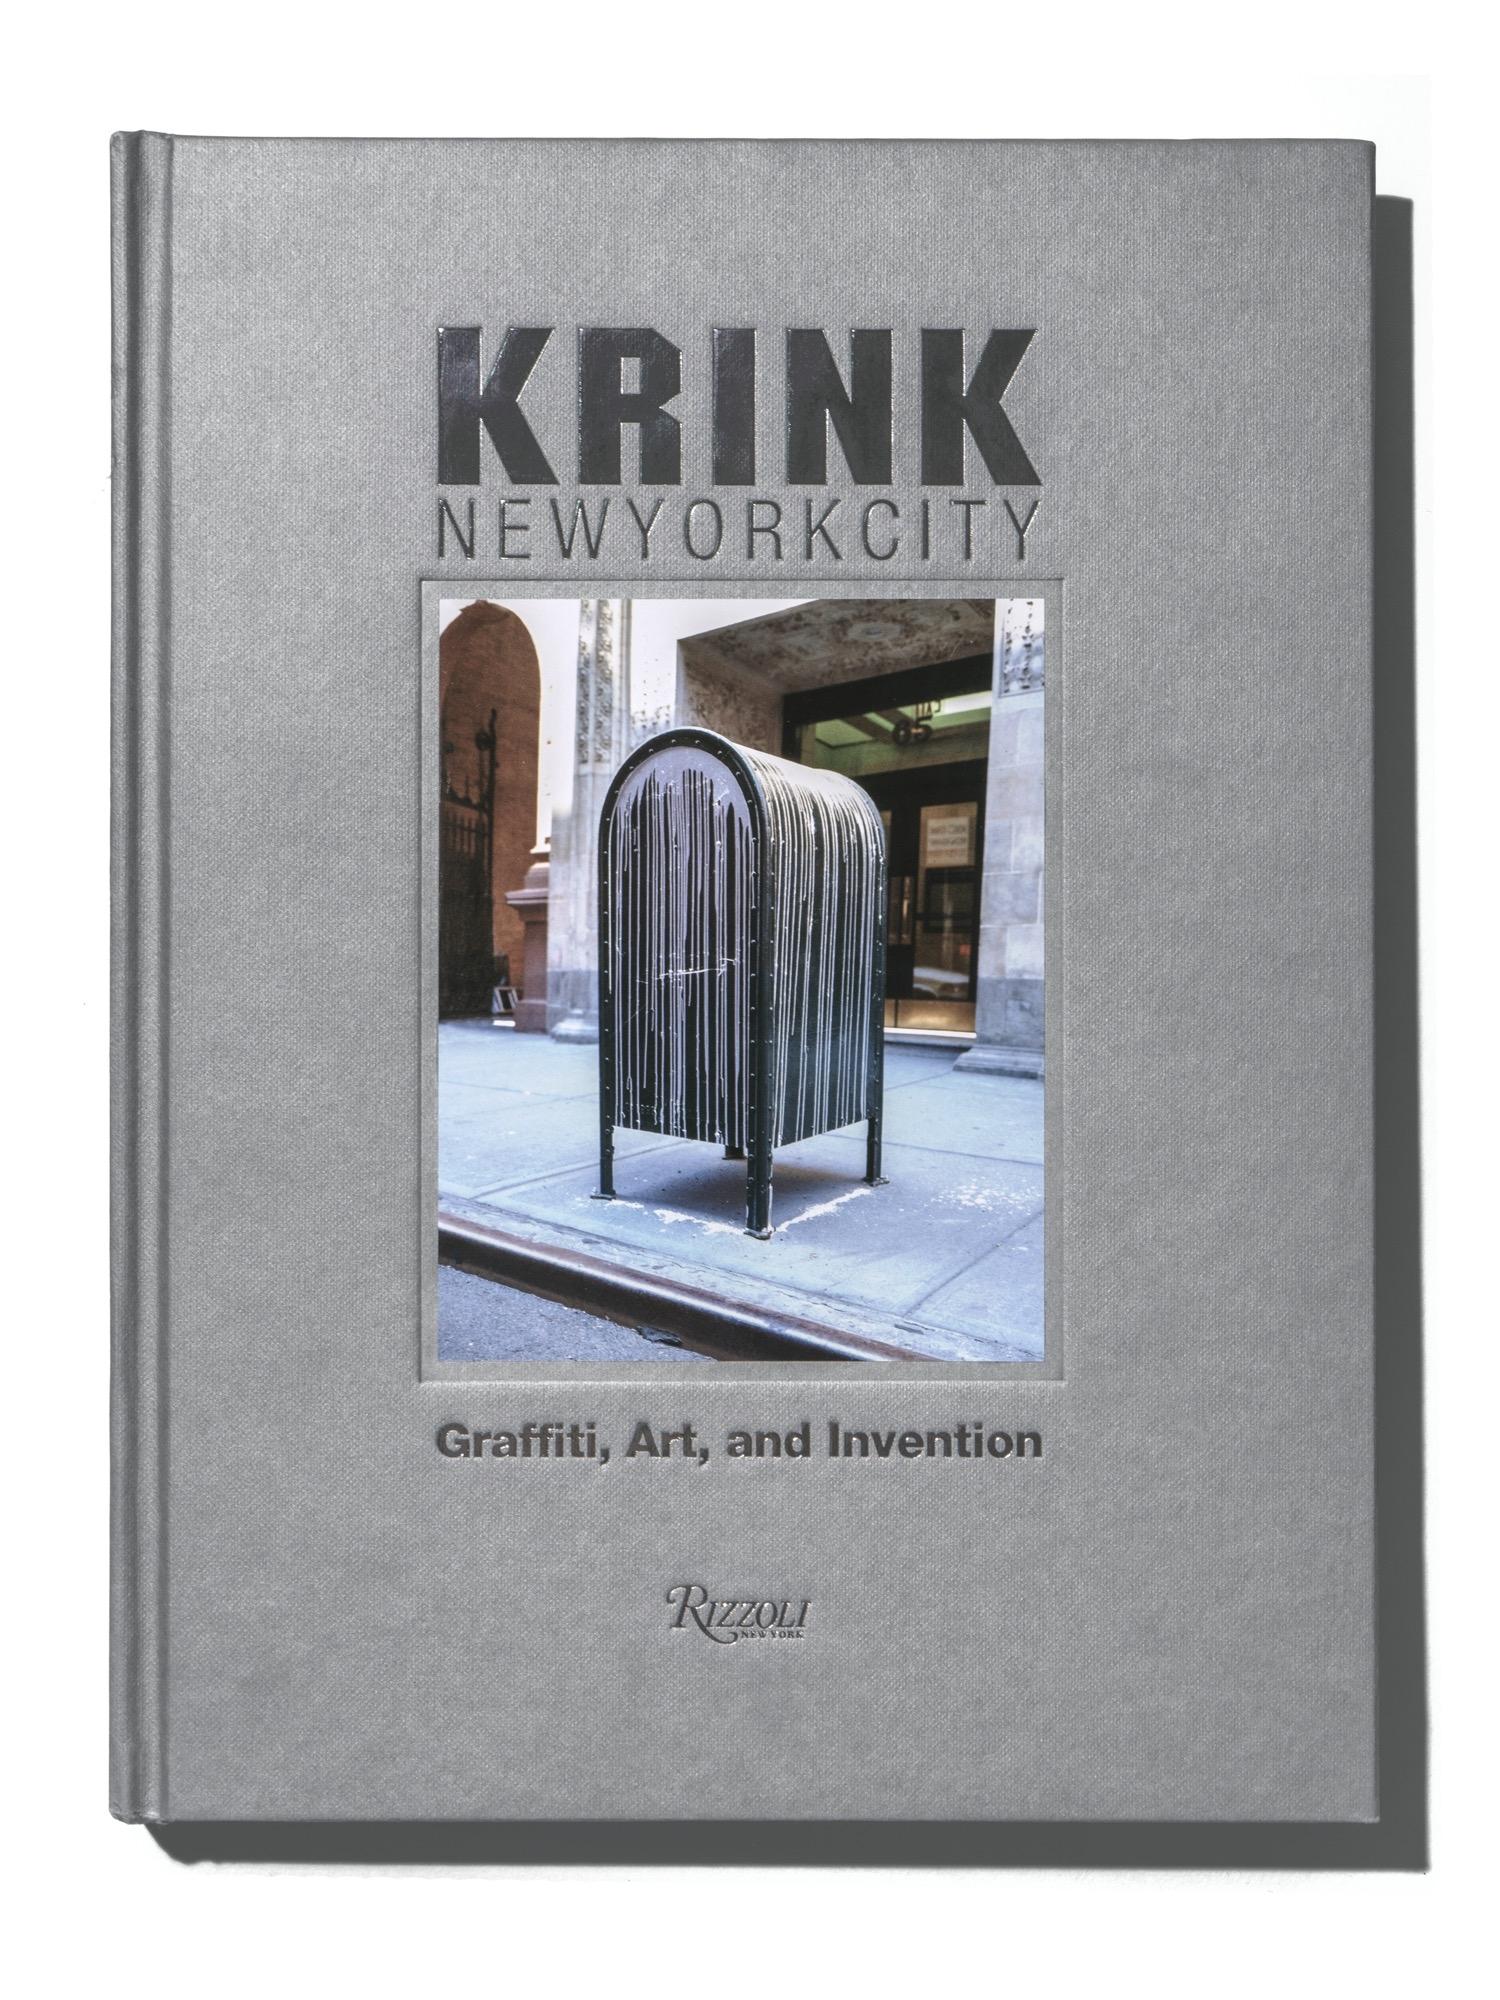 Books: KRINK New York City: Graffiti, Art, and Invention